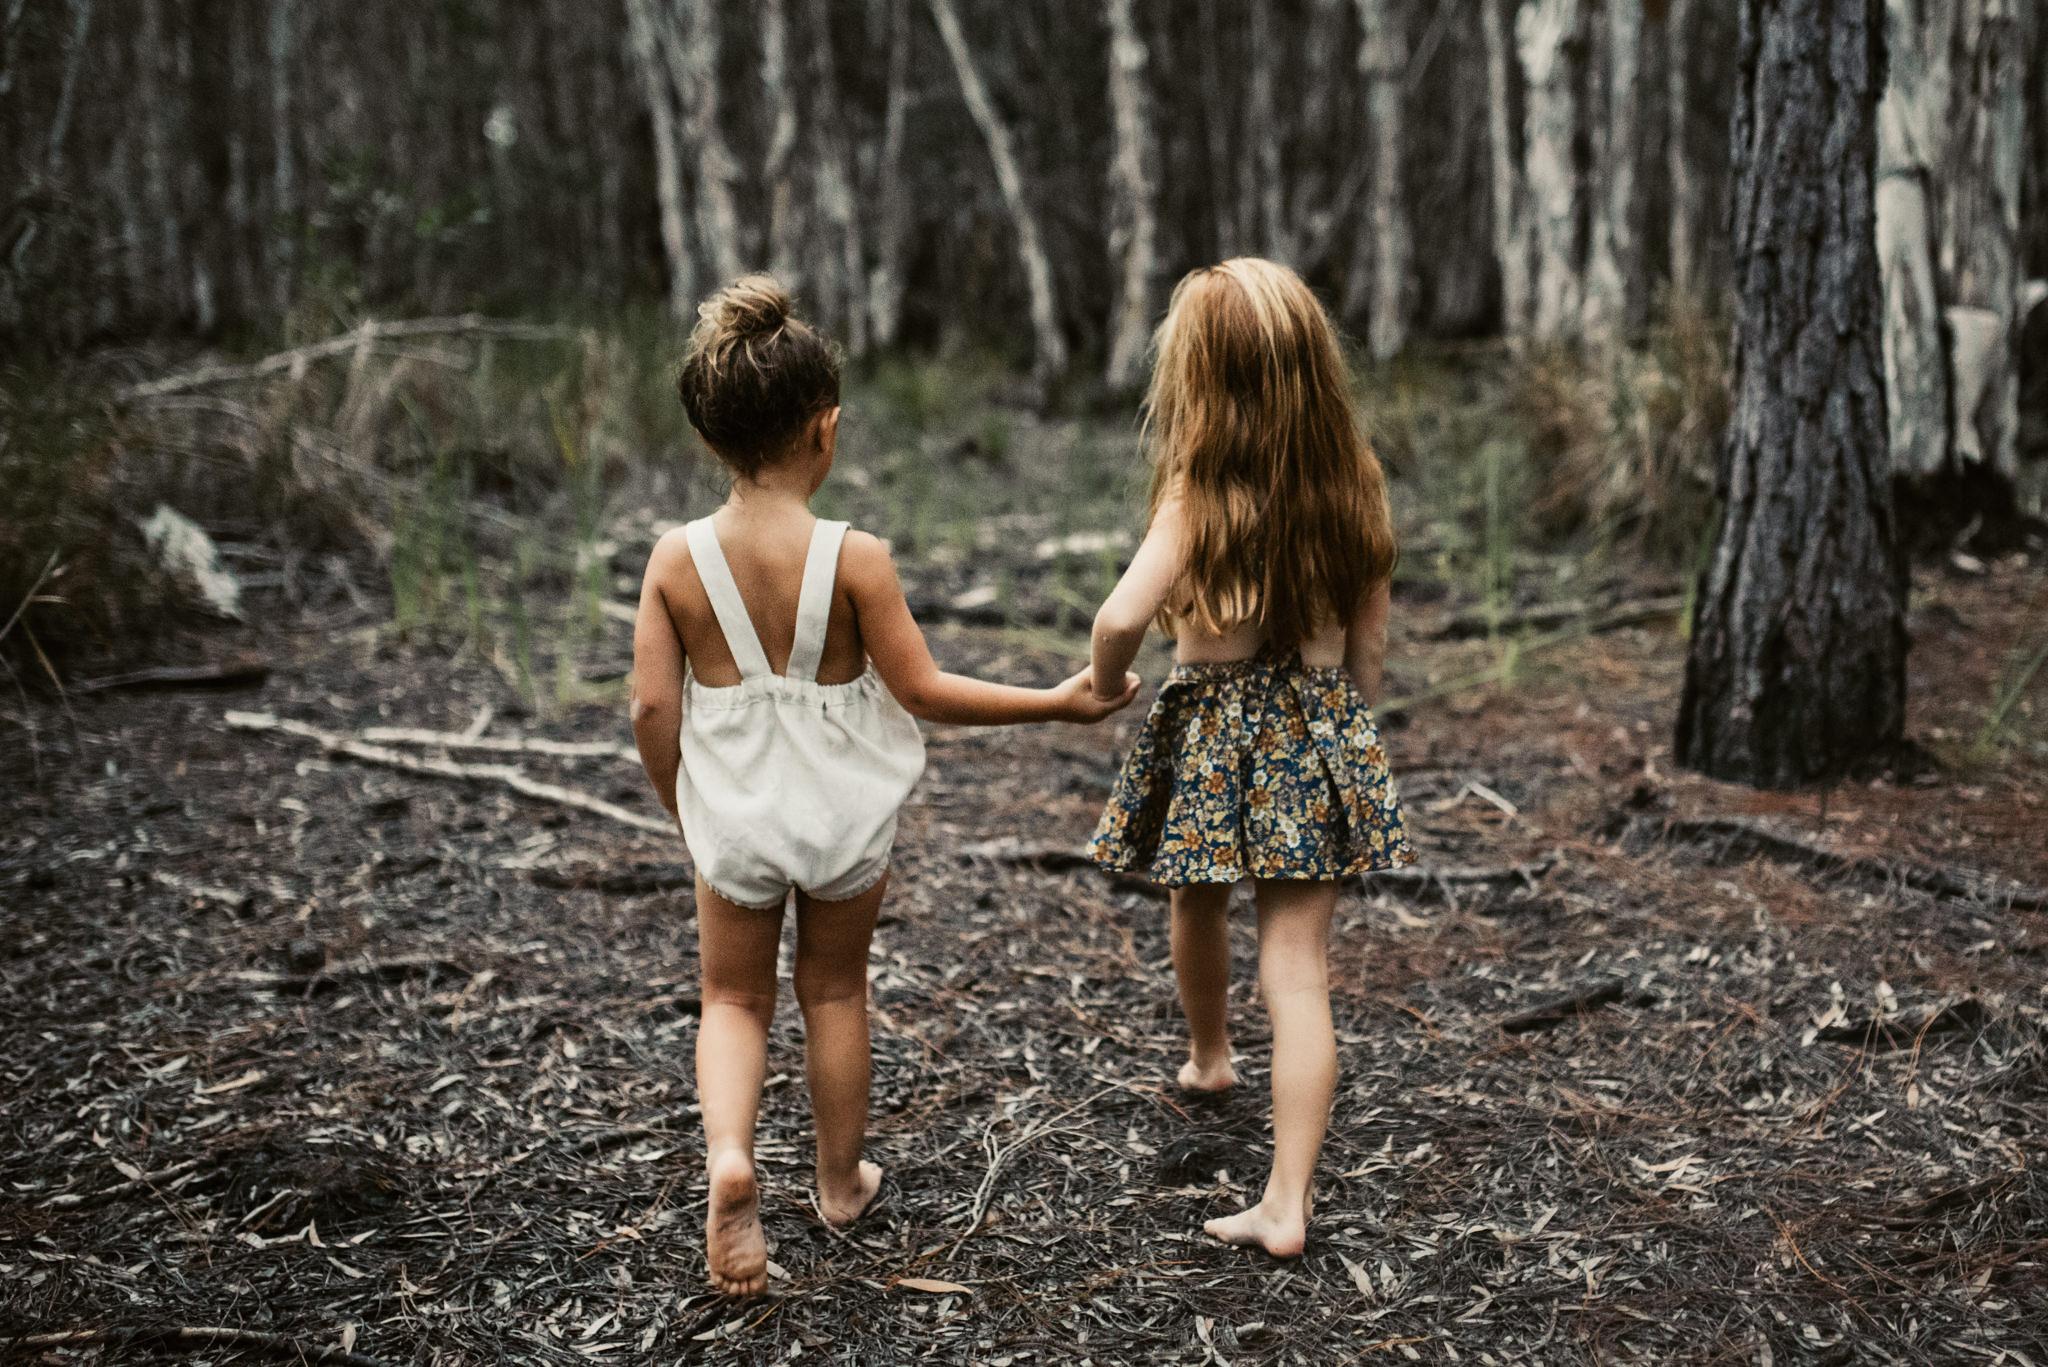 twyla jones photography - treasure coast florida - childrens adventure clothing commercial shoot--54.jpg